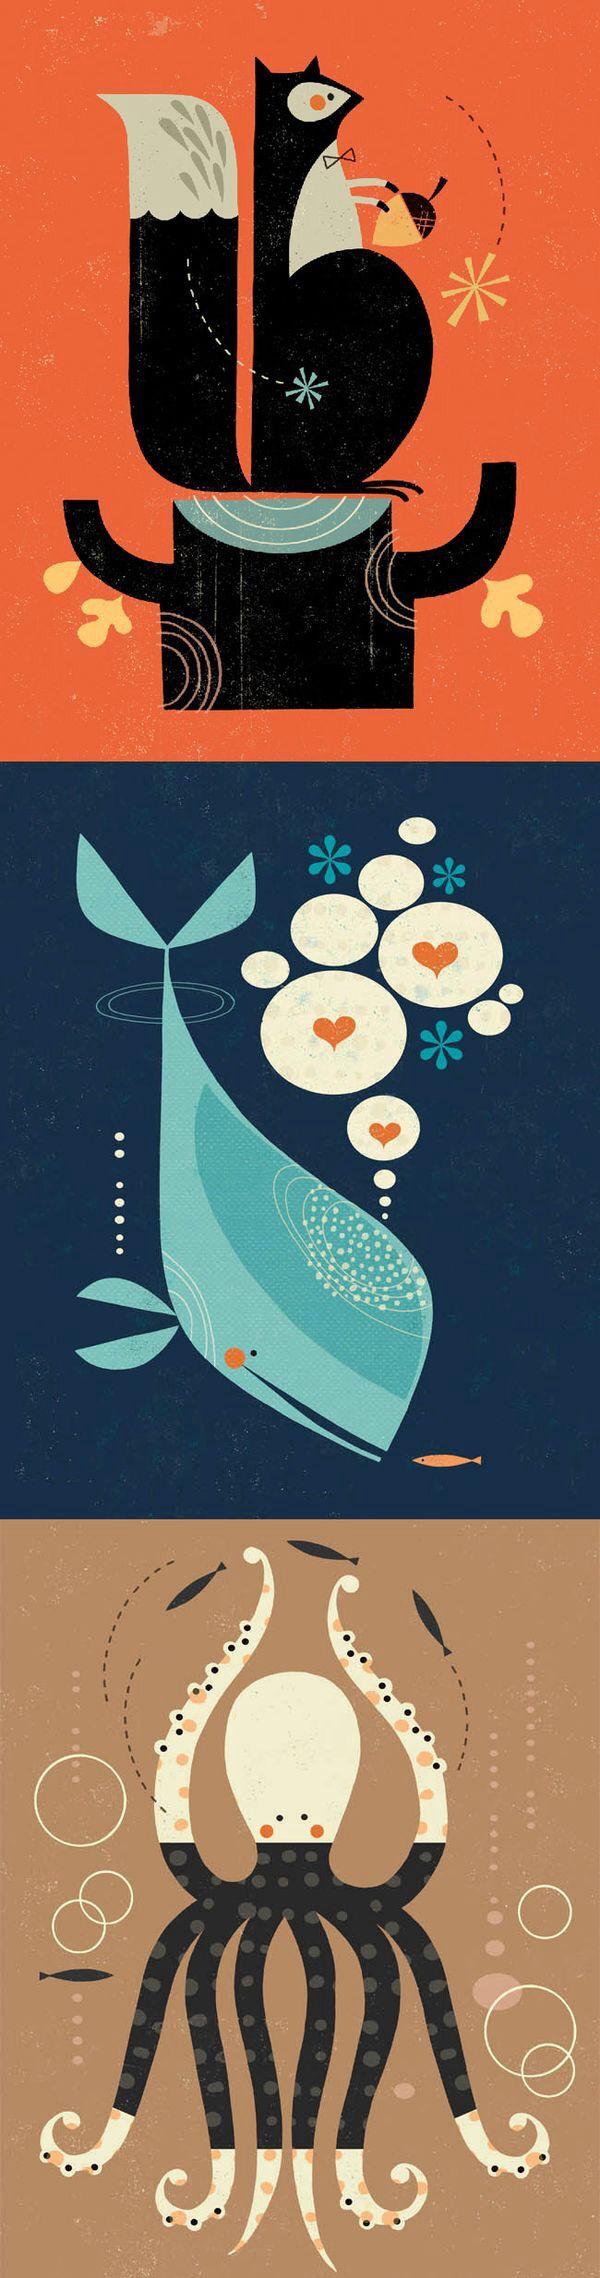 best Illustrations images on Pinterest